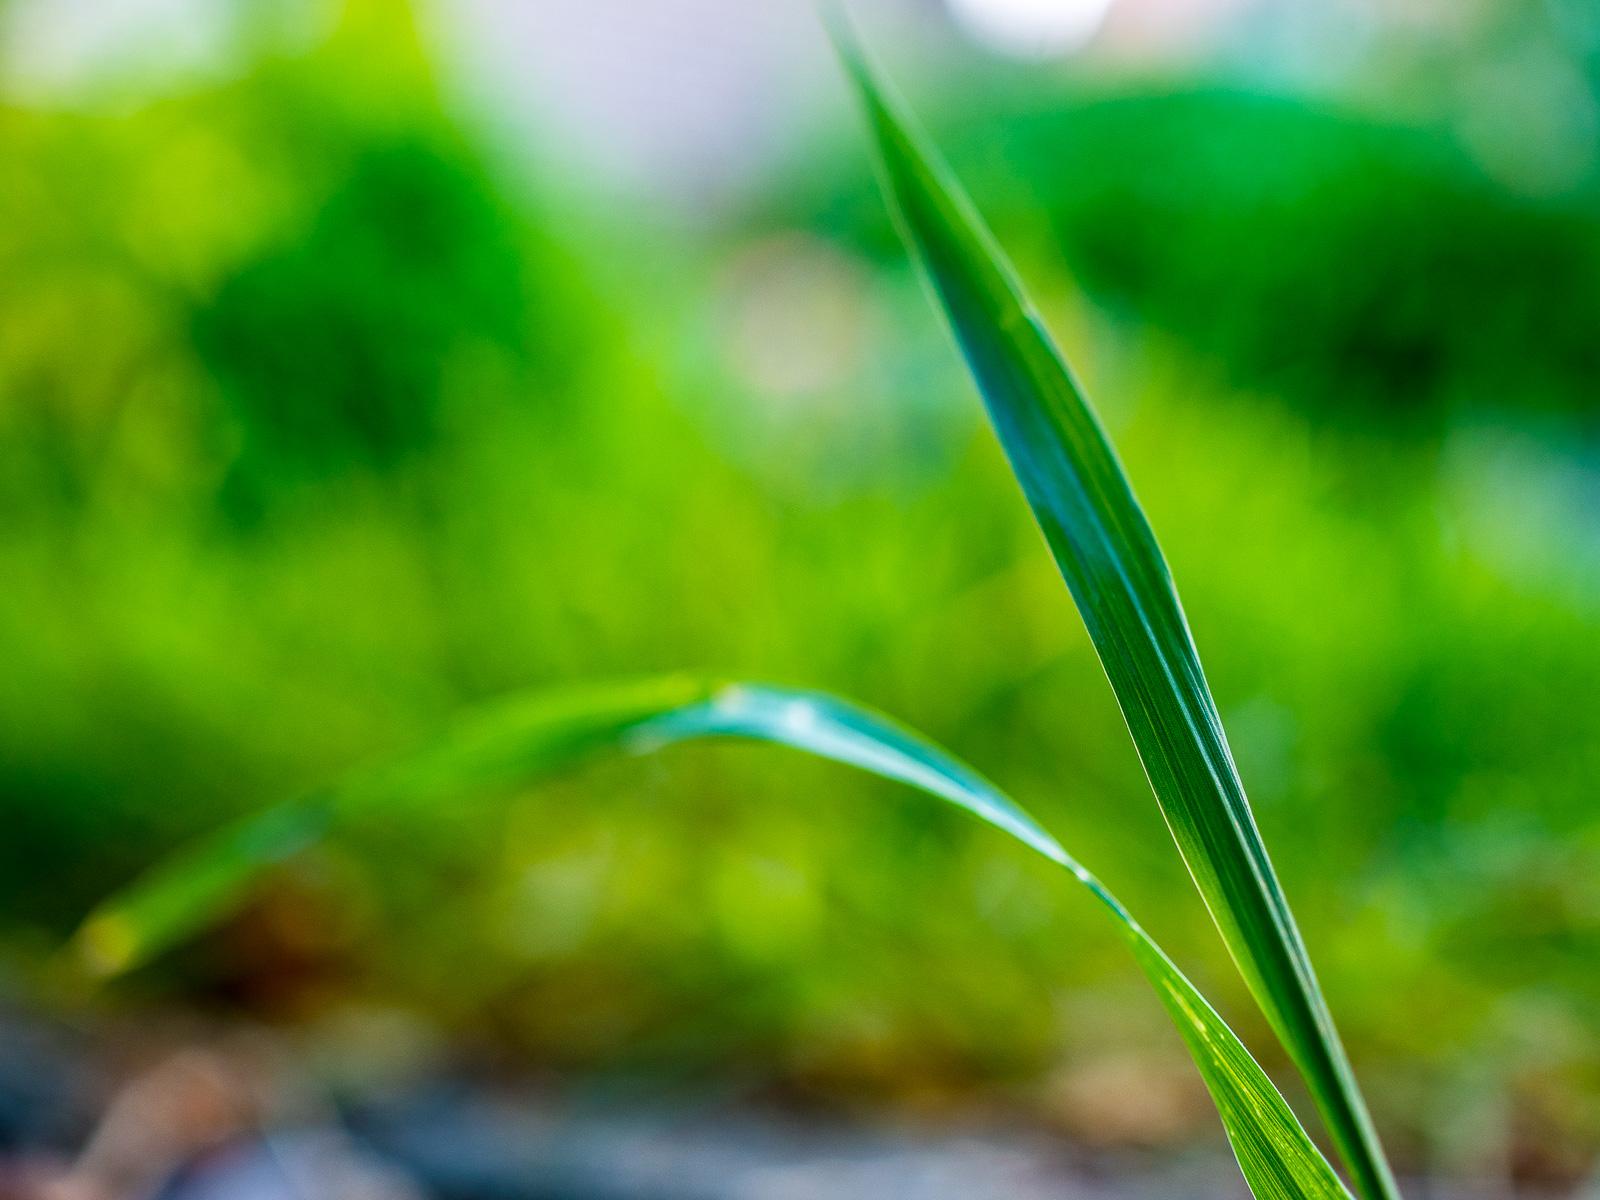 Grashalm am Rand des Rasens